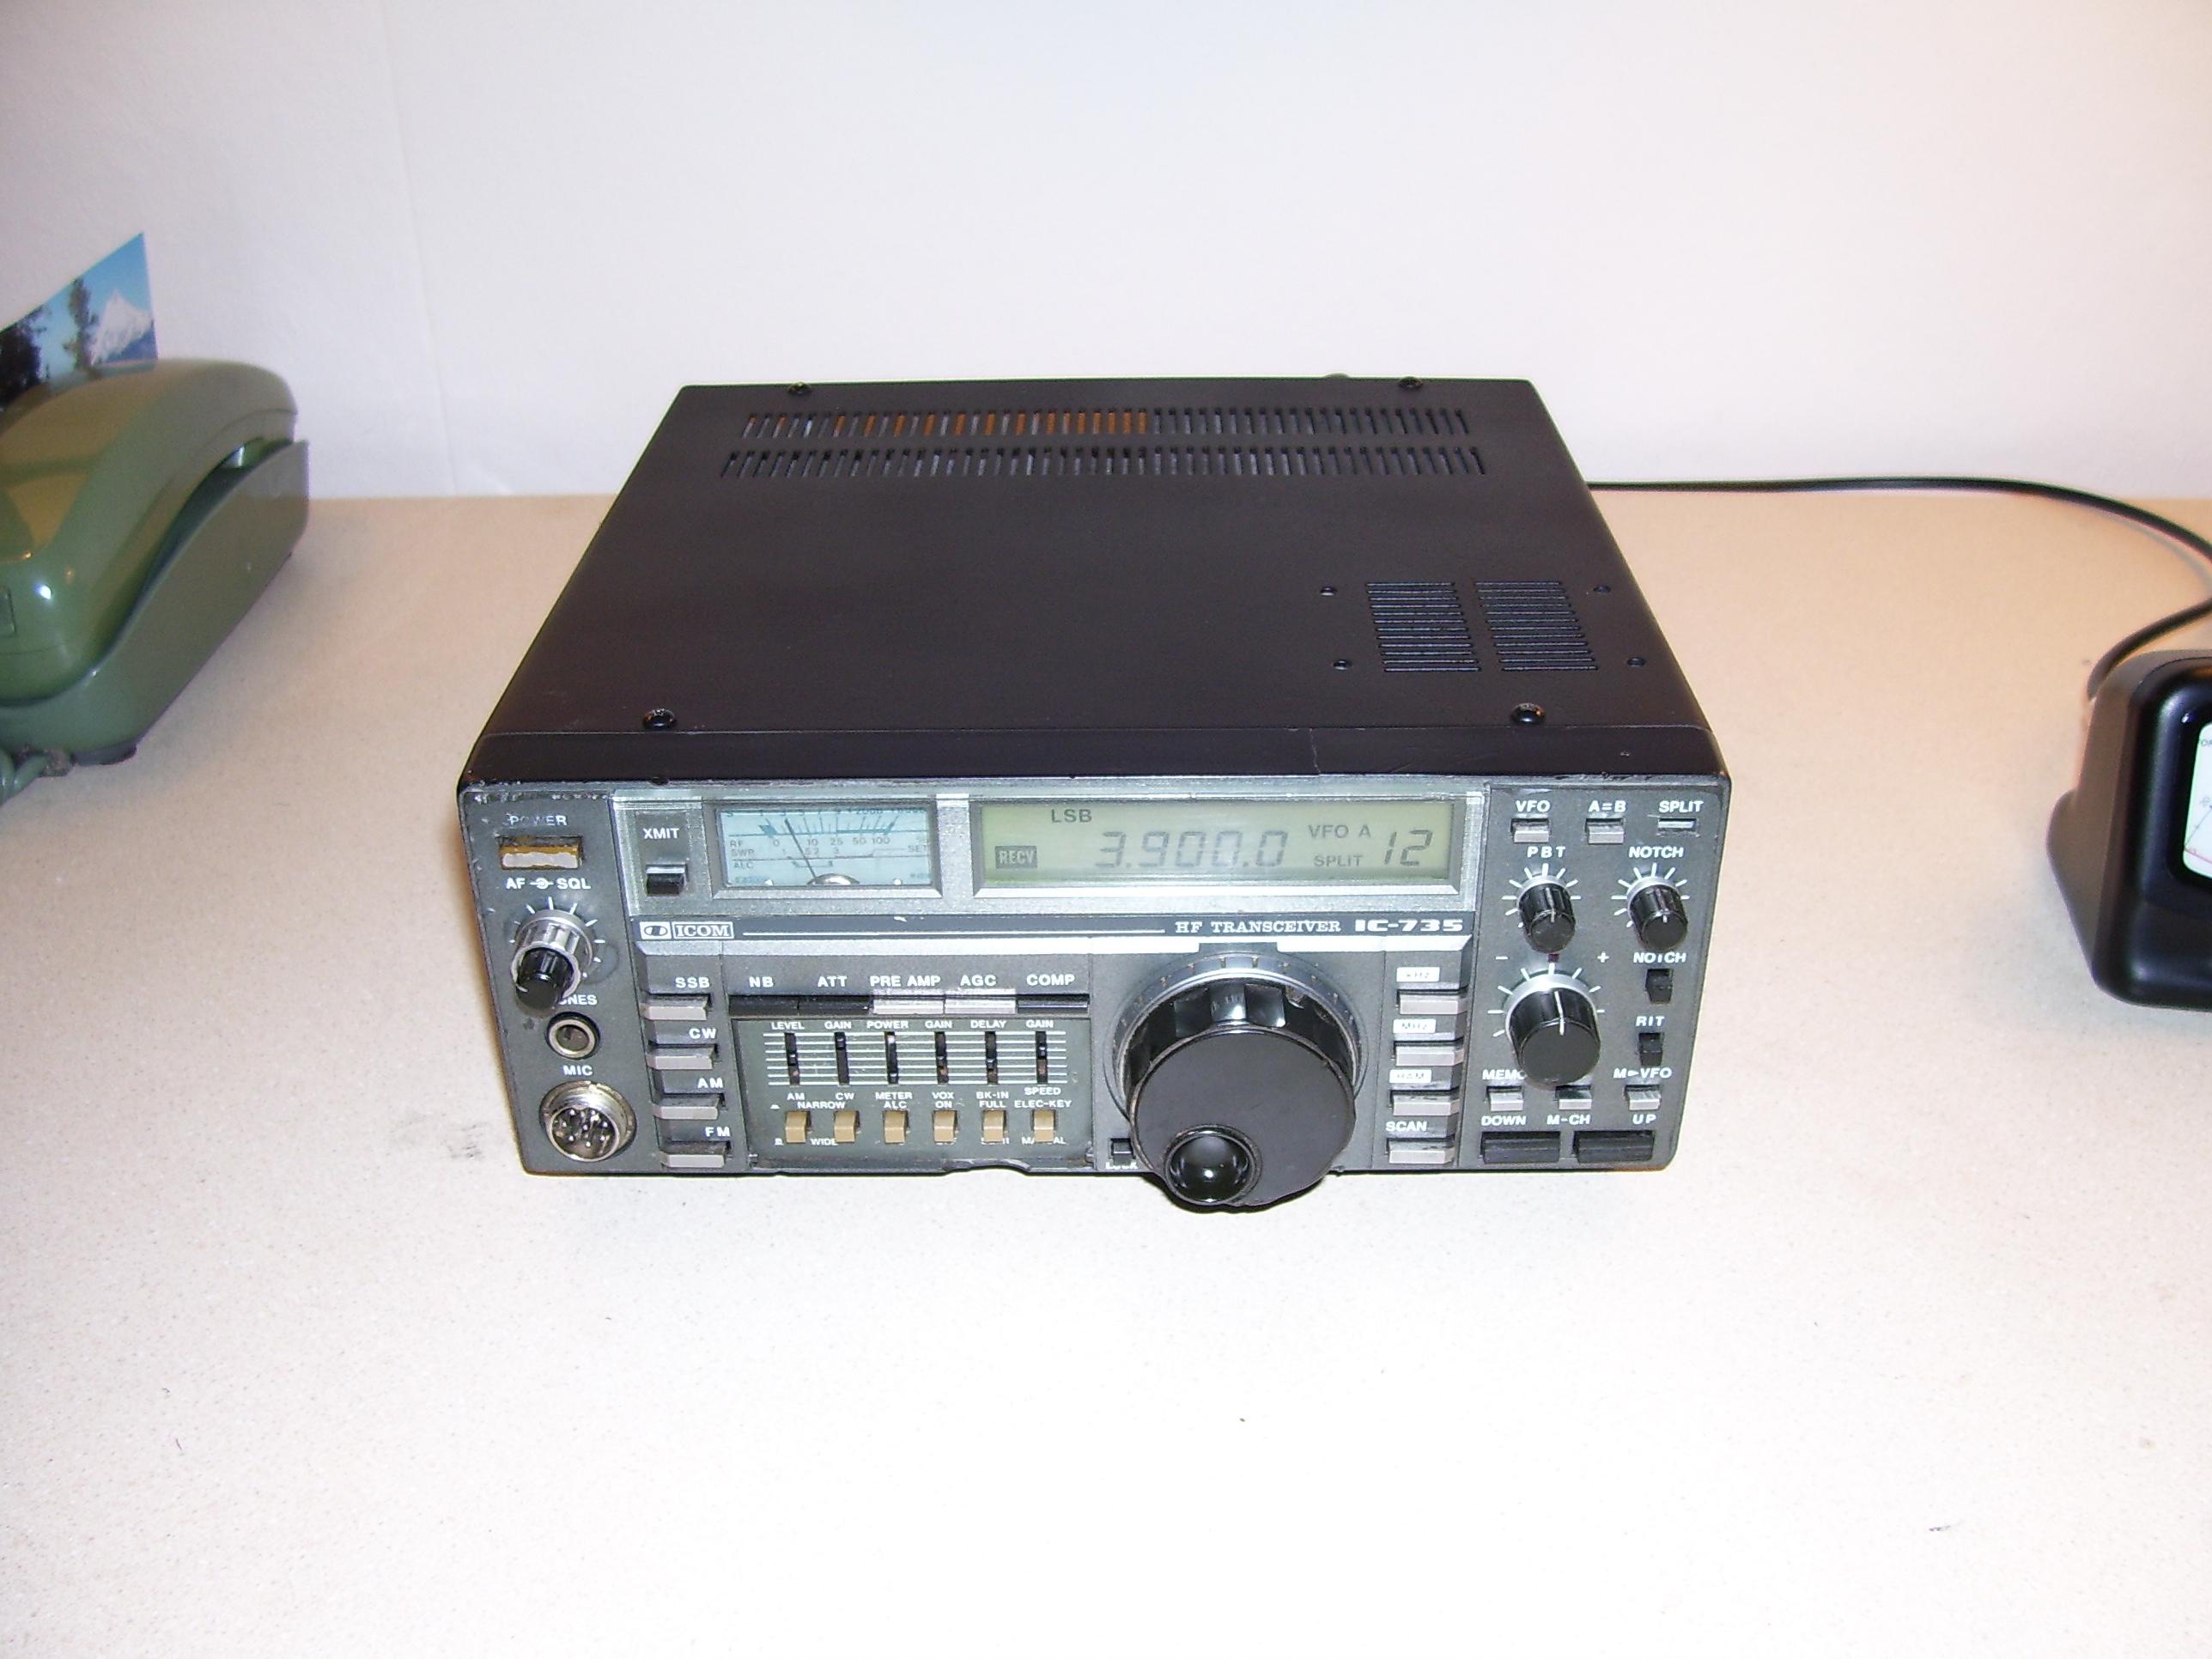 Icom IC-735 Repair